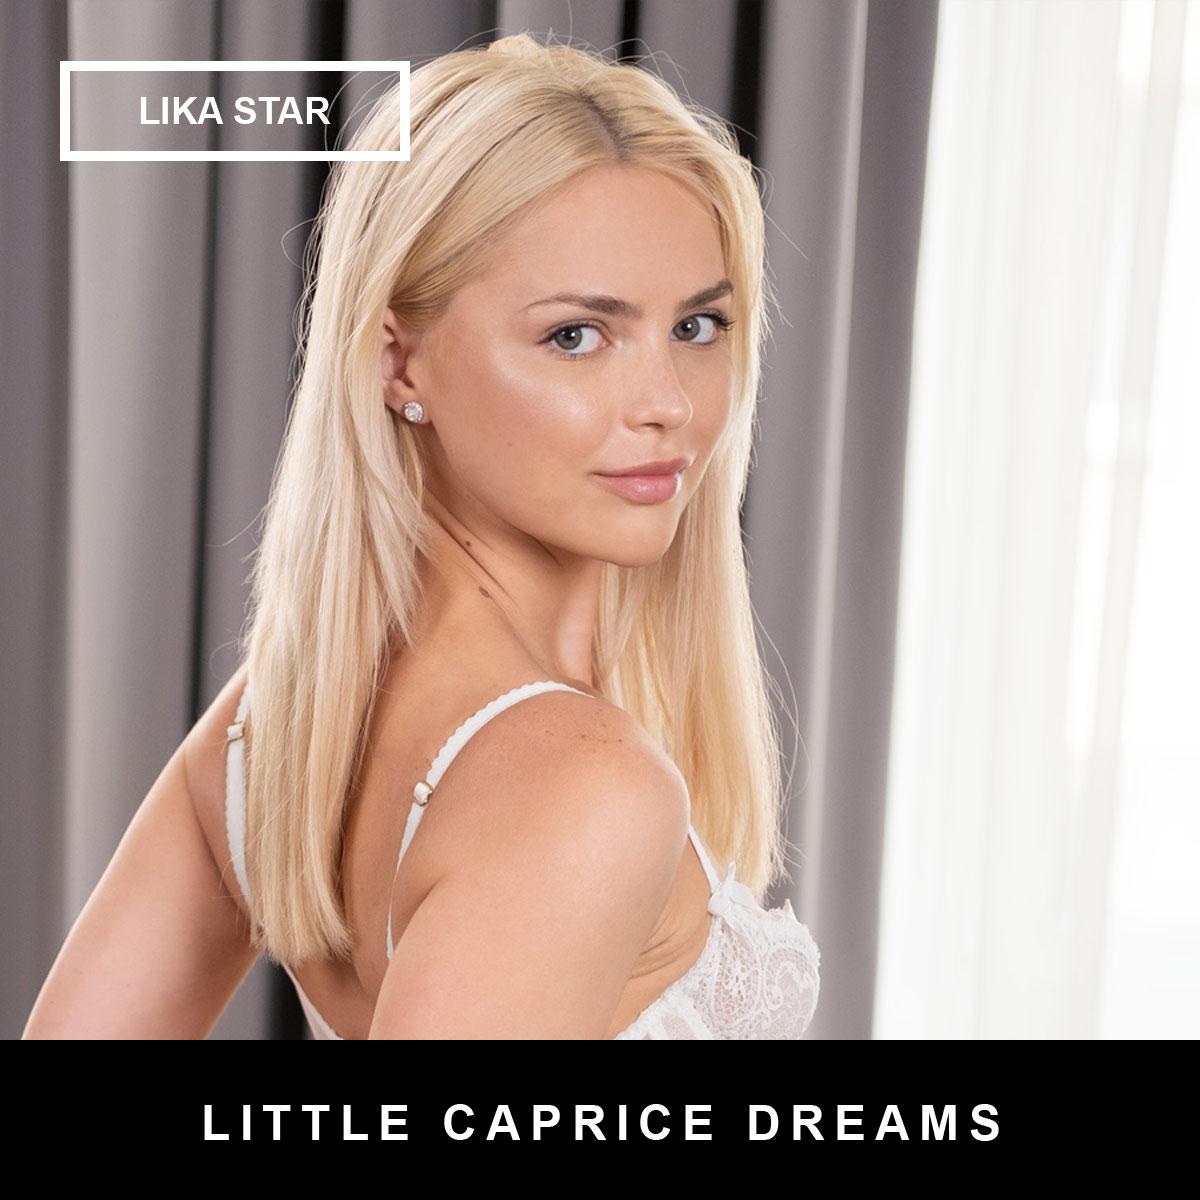 Lika Star, Little Caprice Dreams